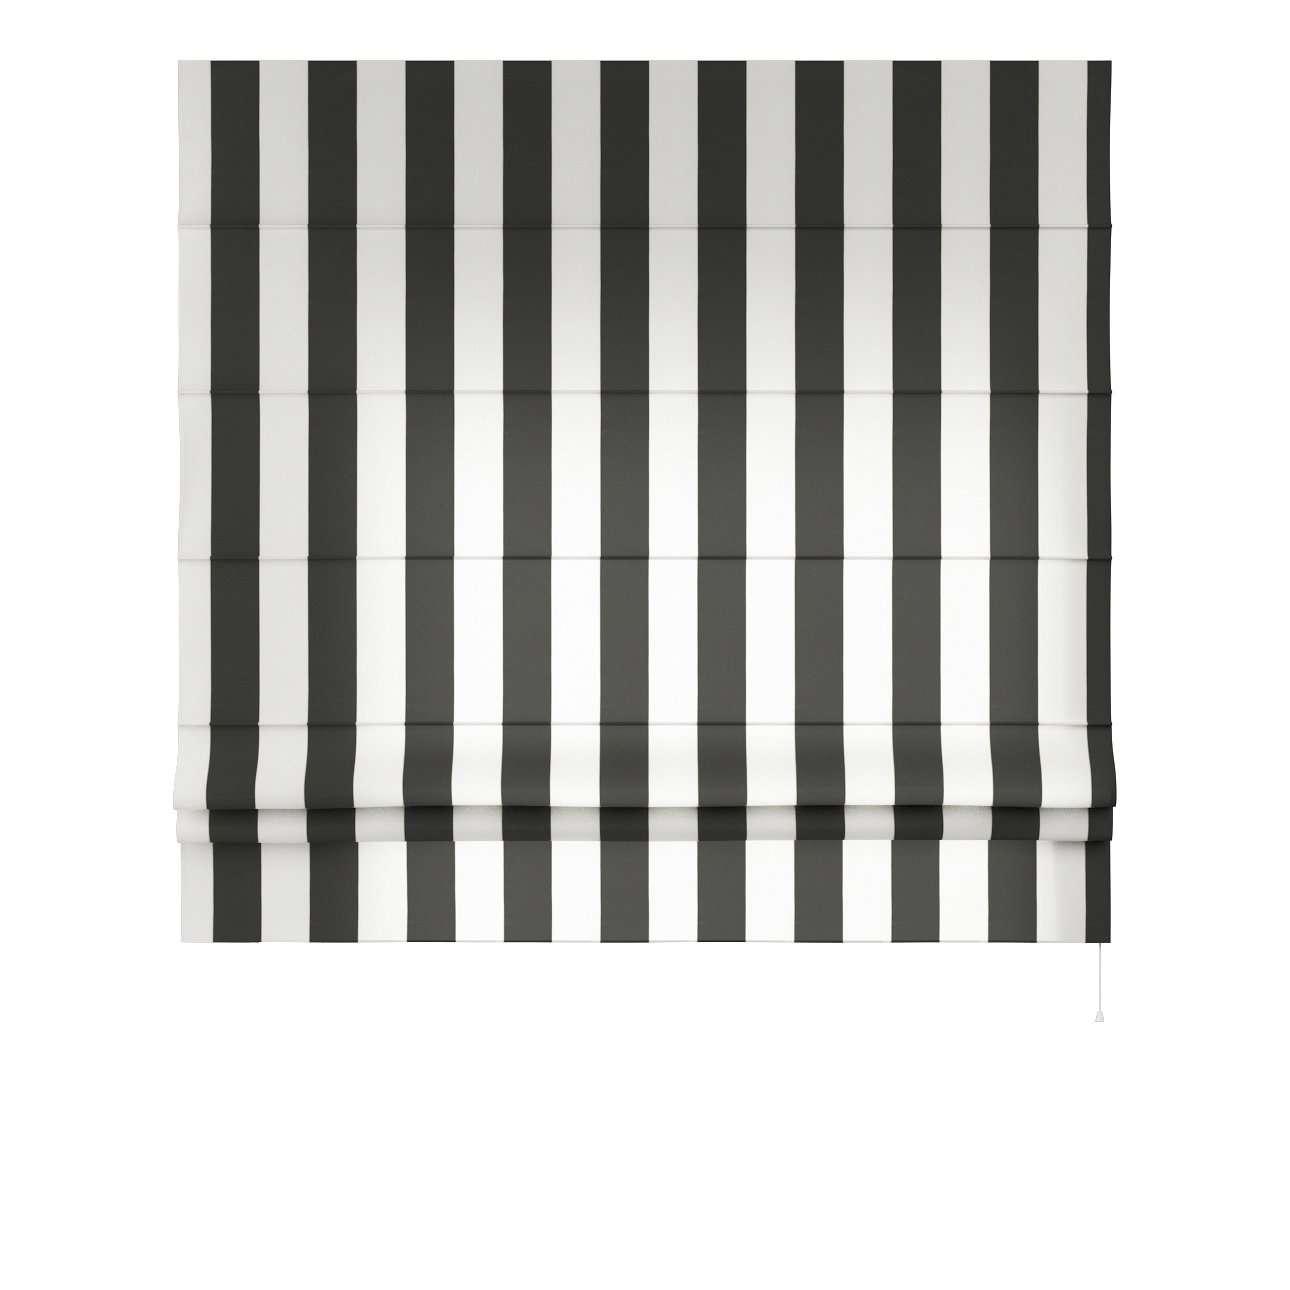 Romanetės Padva 80 × 170 cm (plotis × ilgis) kolekcijoje Comics Prints, audinys: 137-53